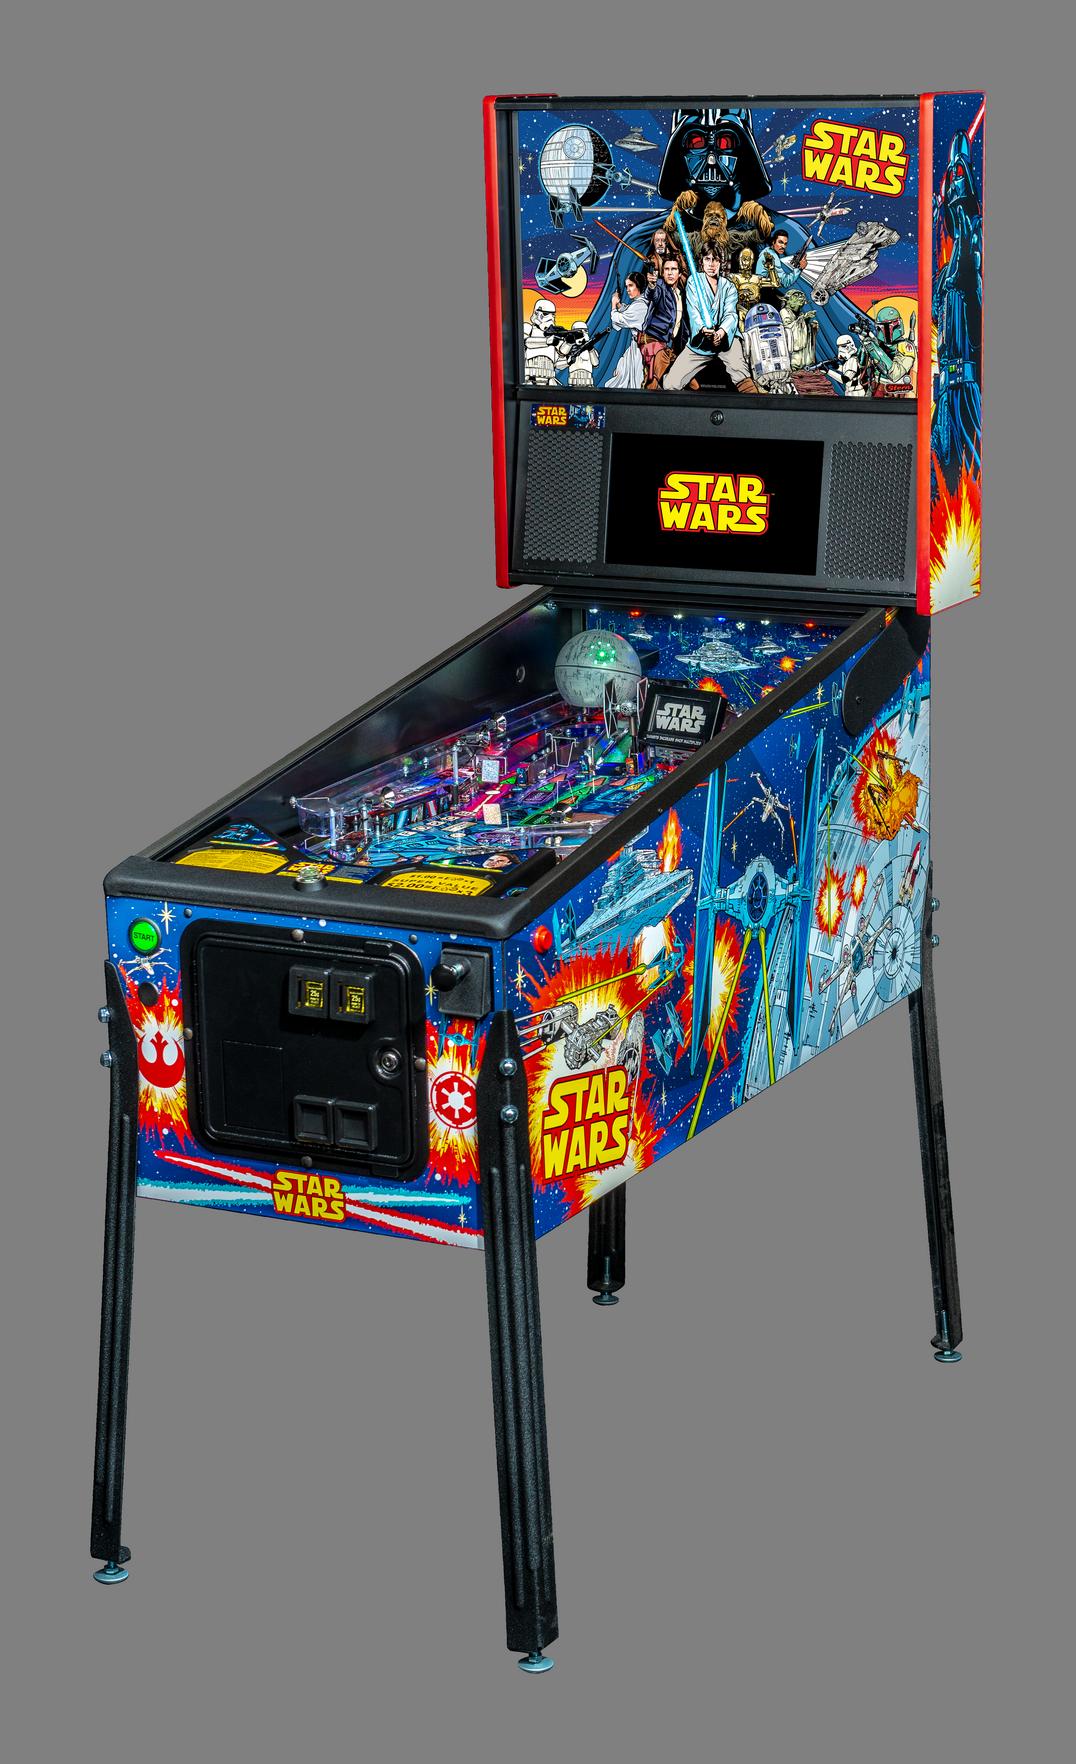 STAR WARS COMIC ART PRO PINBALL - Full Sized Preview